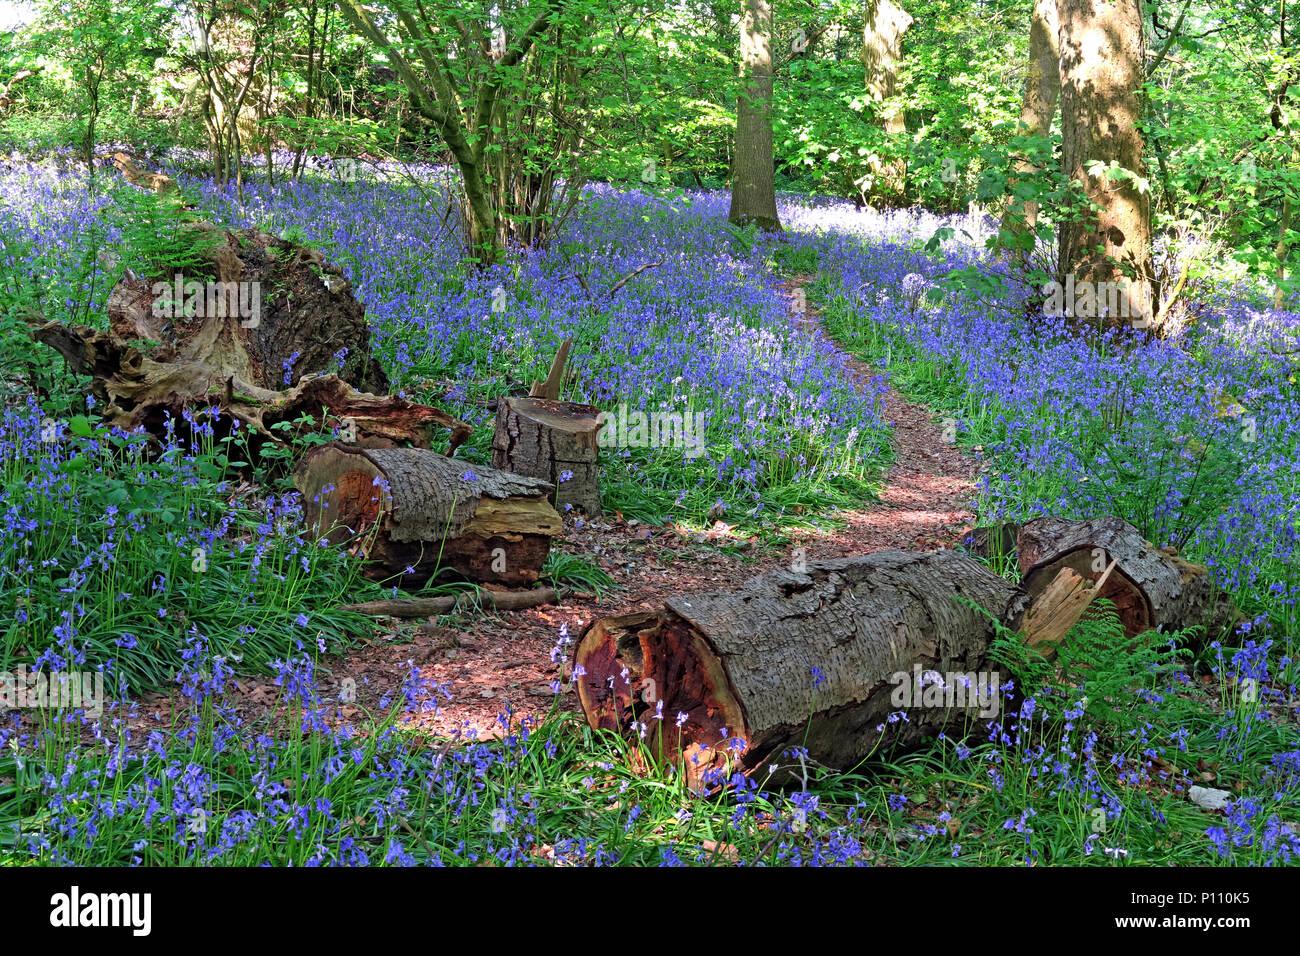 English Bluebell Wood in spring, Cheshire, England, UK - Stock Image